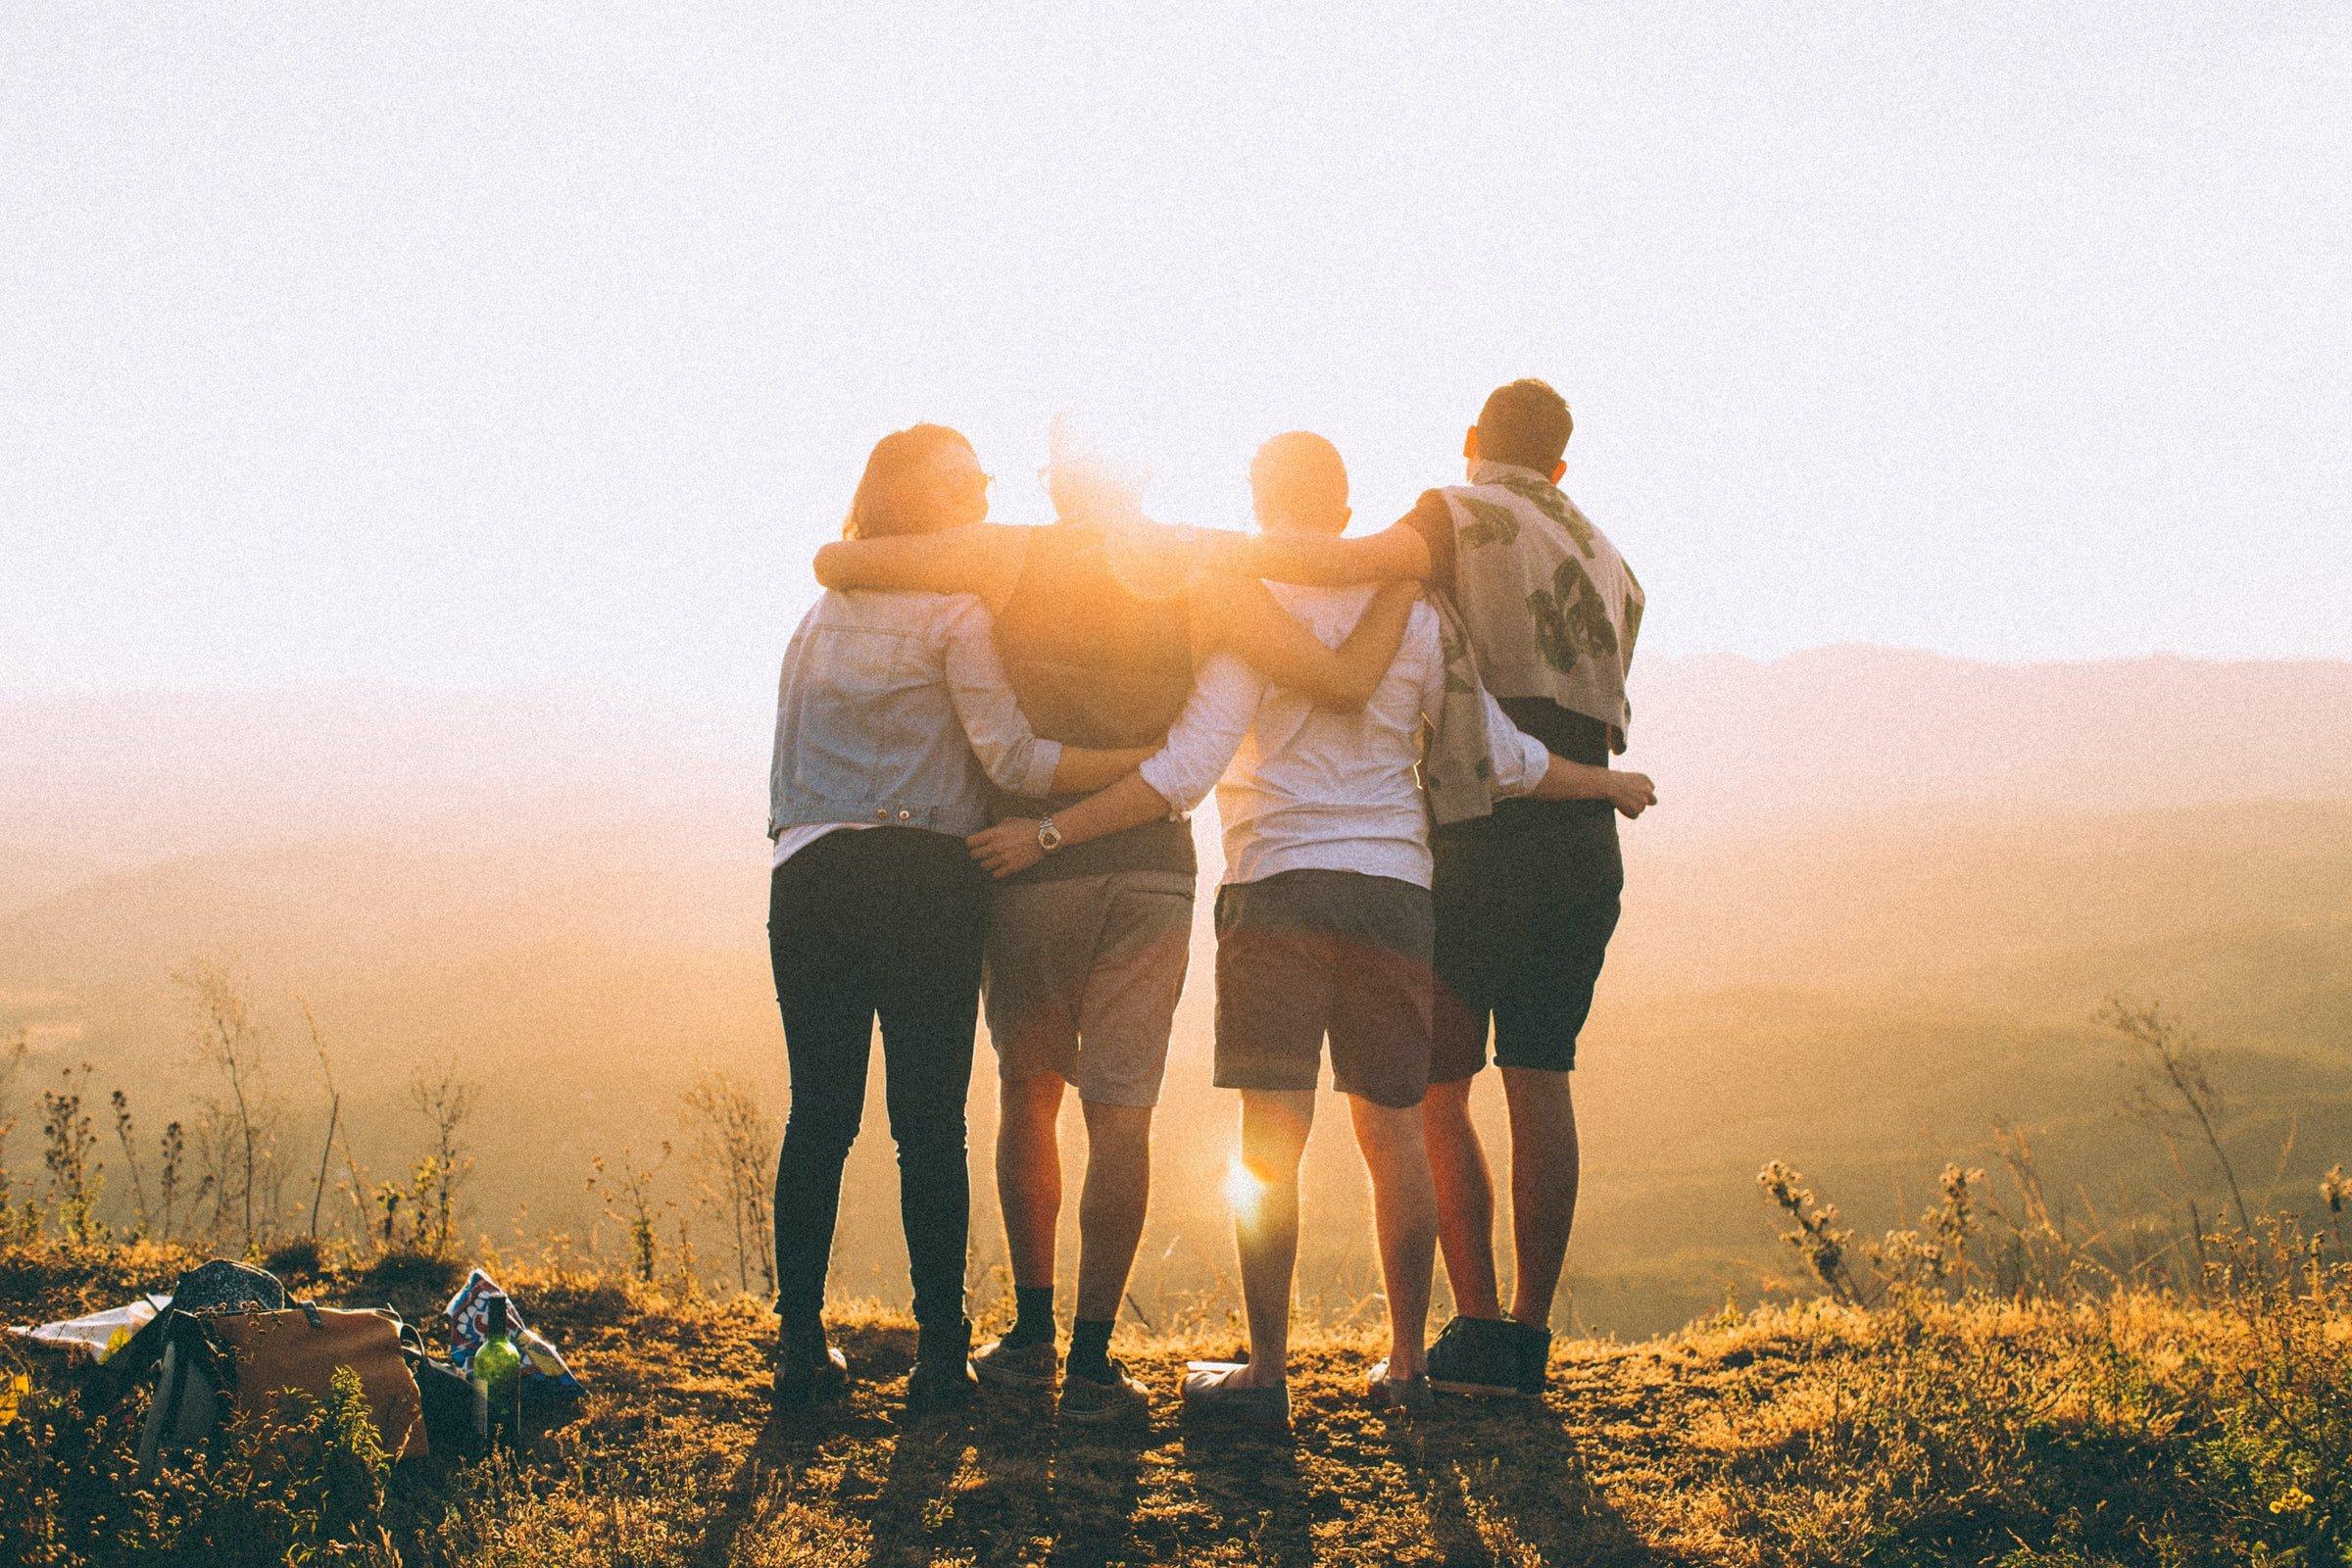 gruppkram i solnedgången